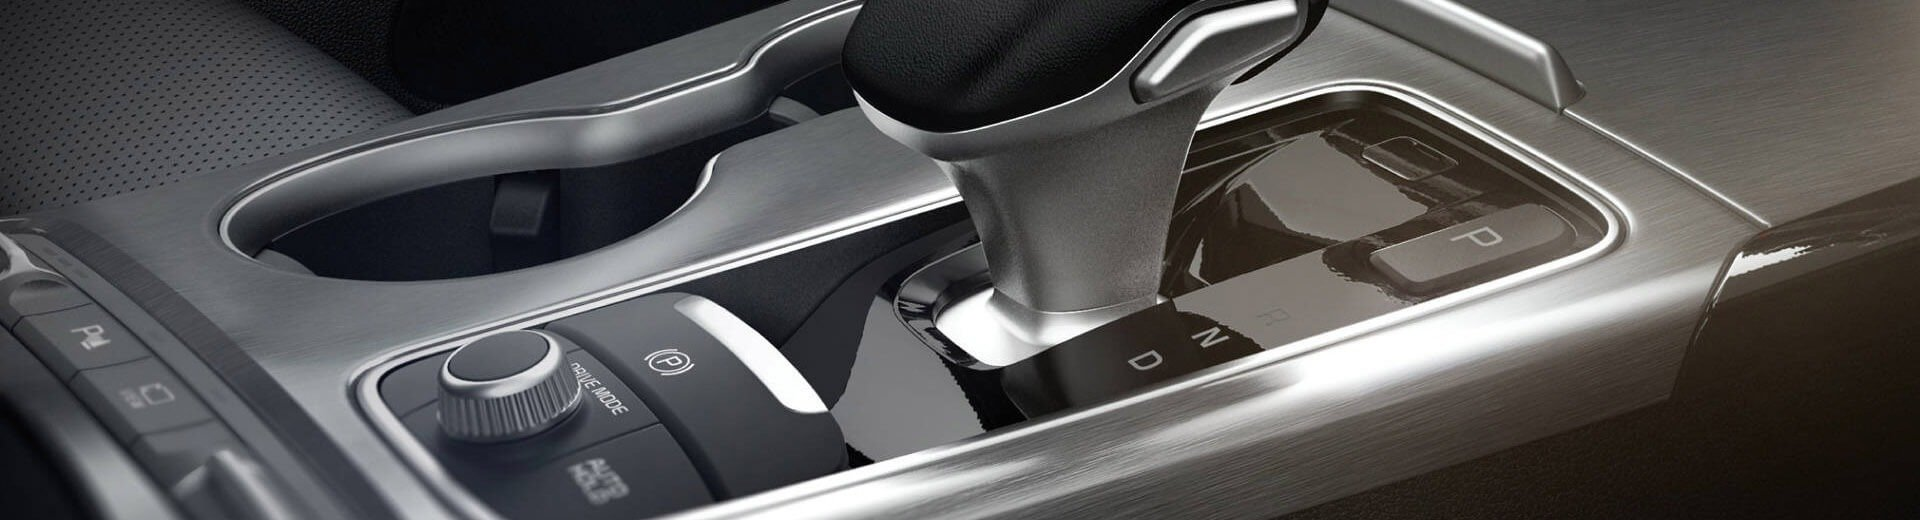 Kia Gearbox - Kia vehicle interior